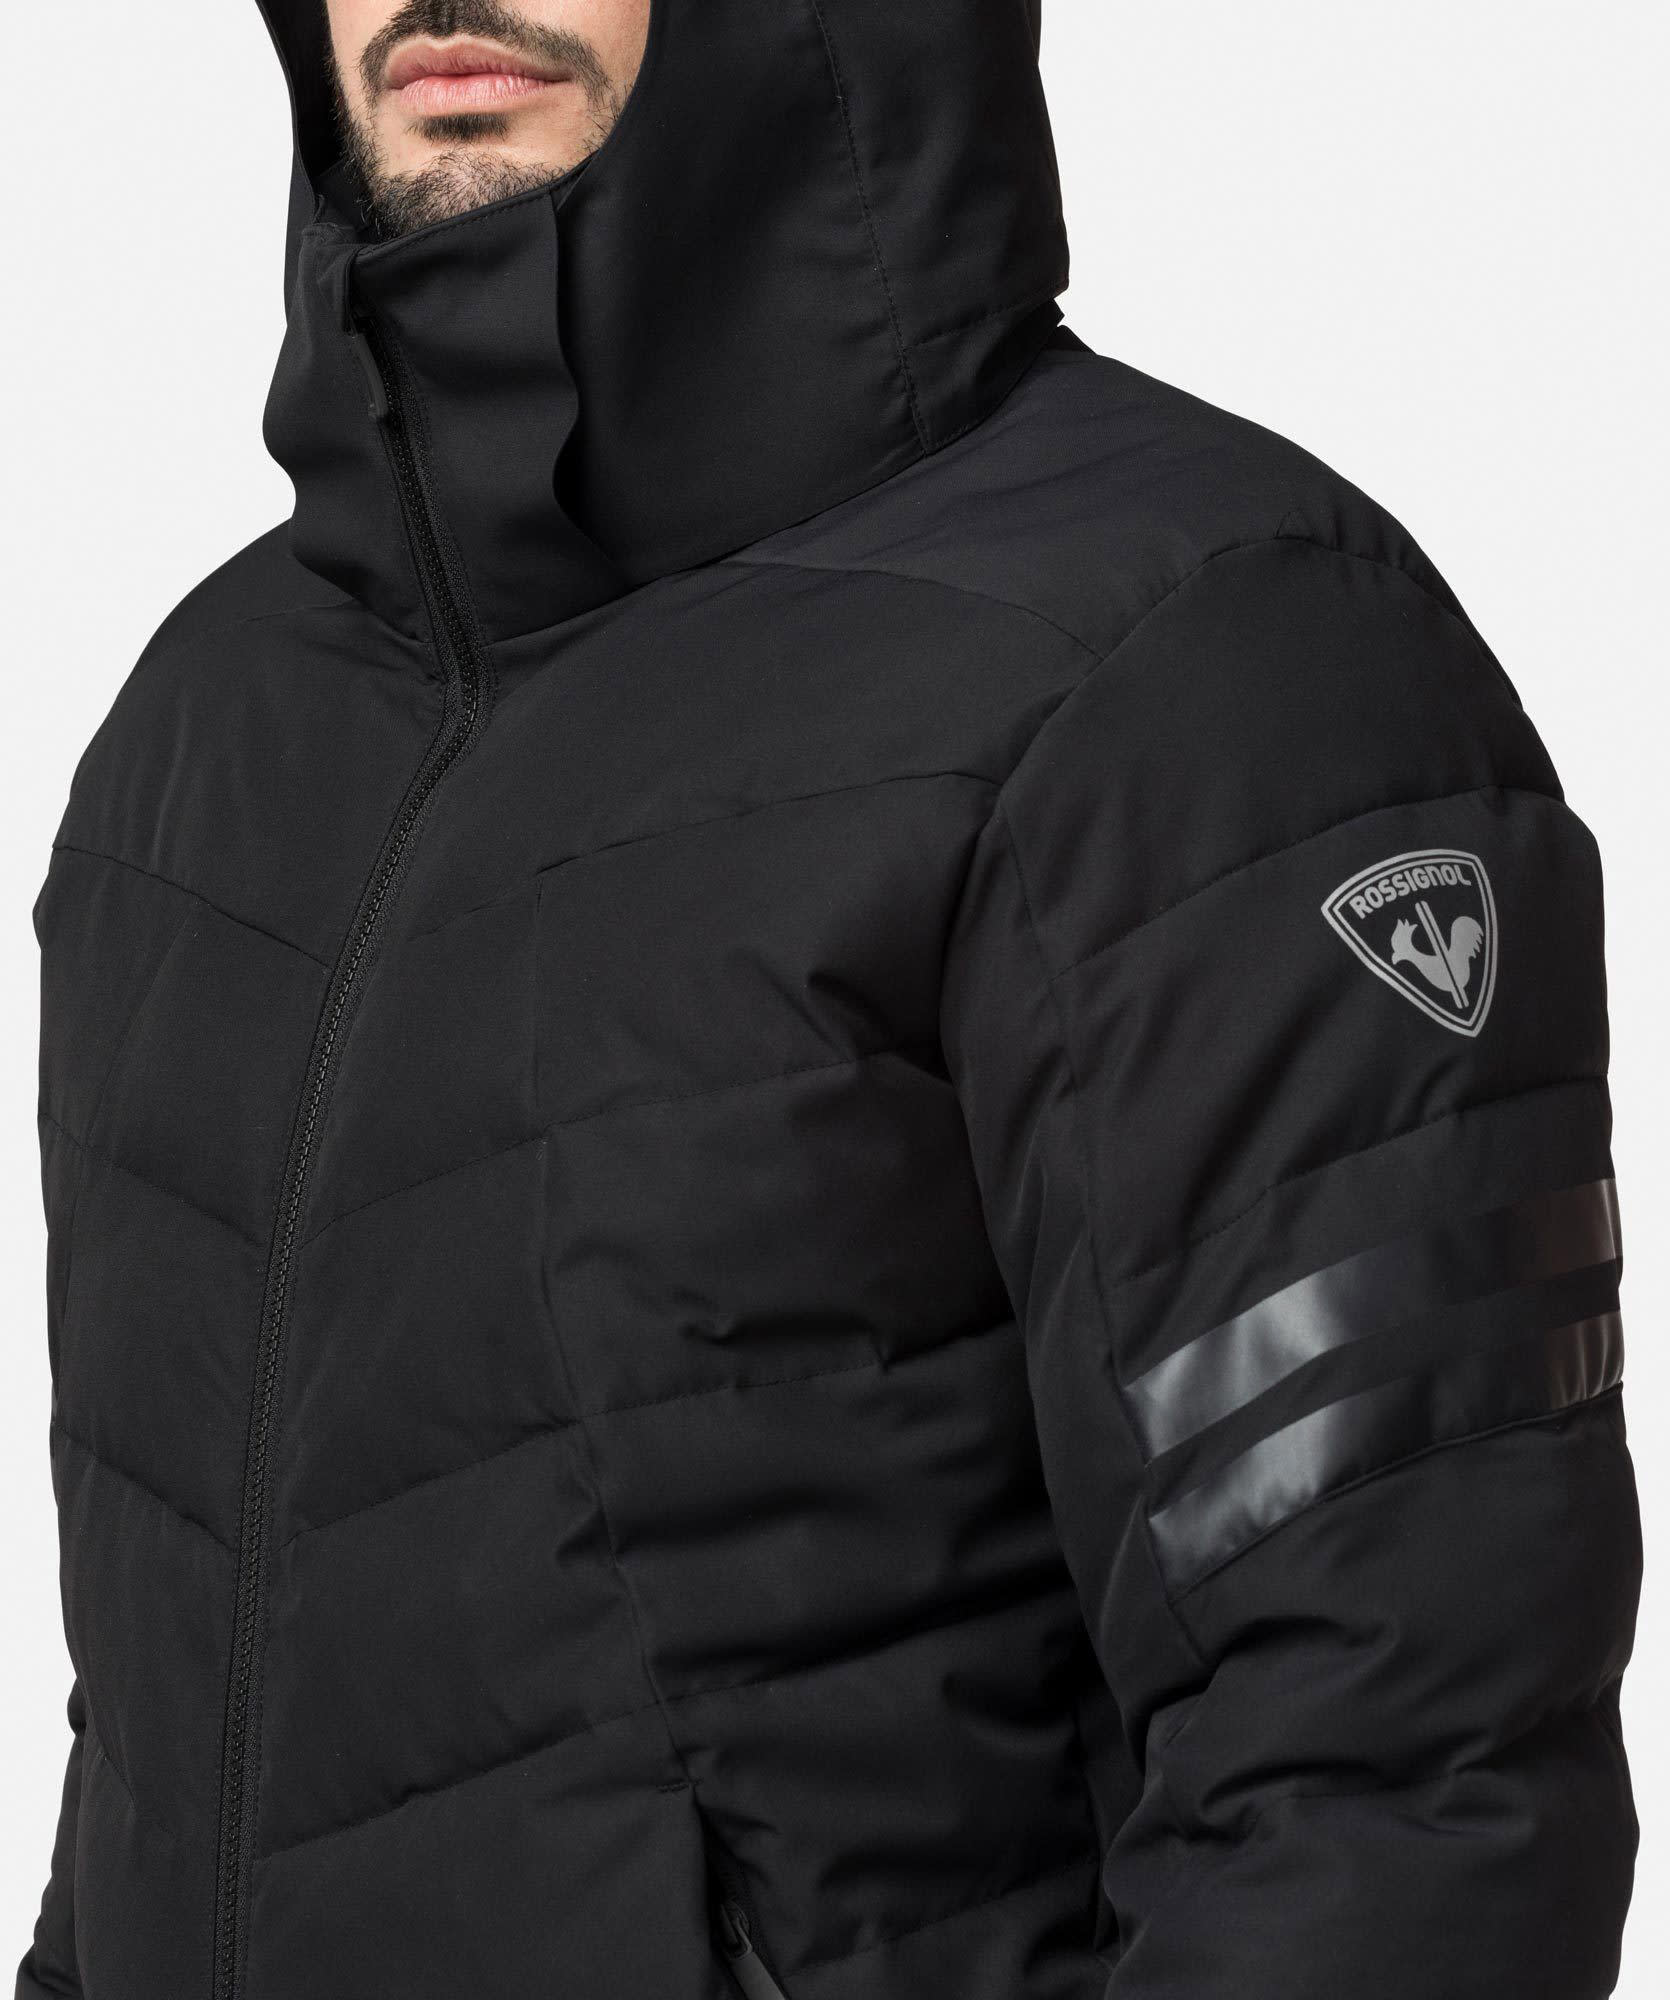 d61269c57bb0 Rossignol Rapide Ski Jacket - thumbnail 4